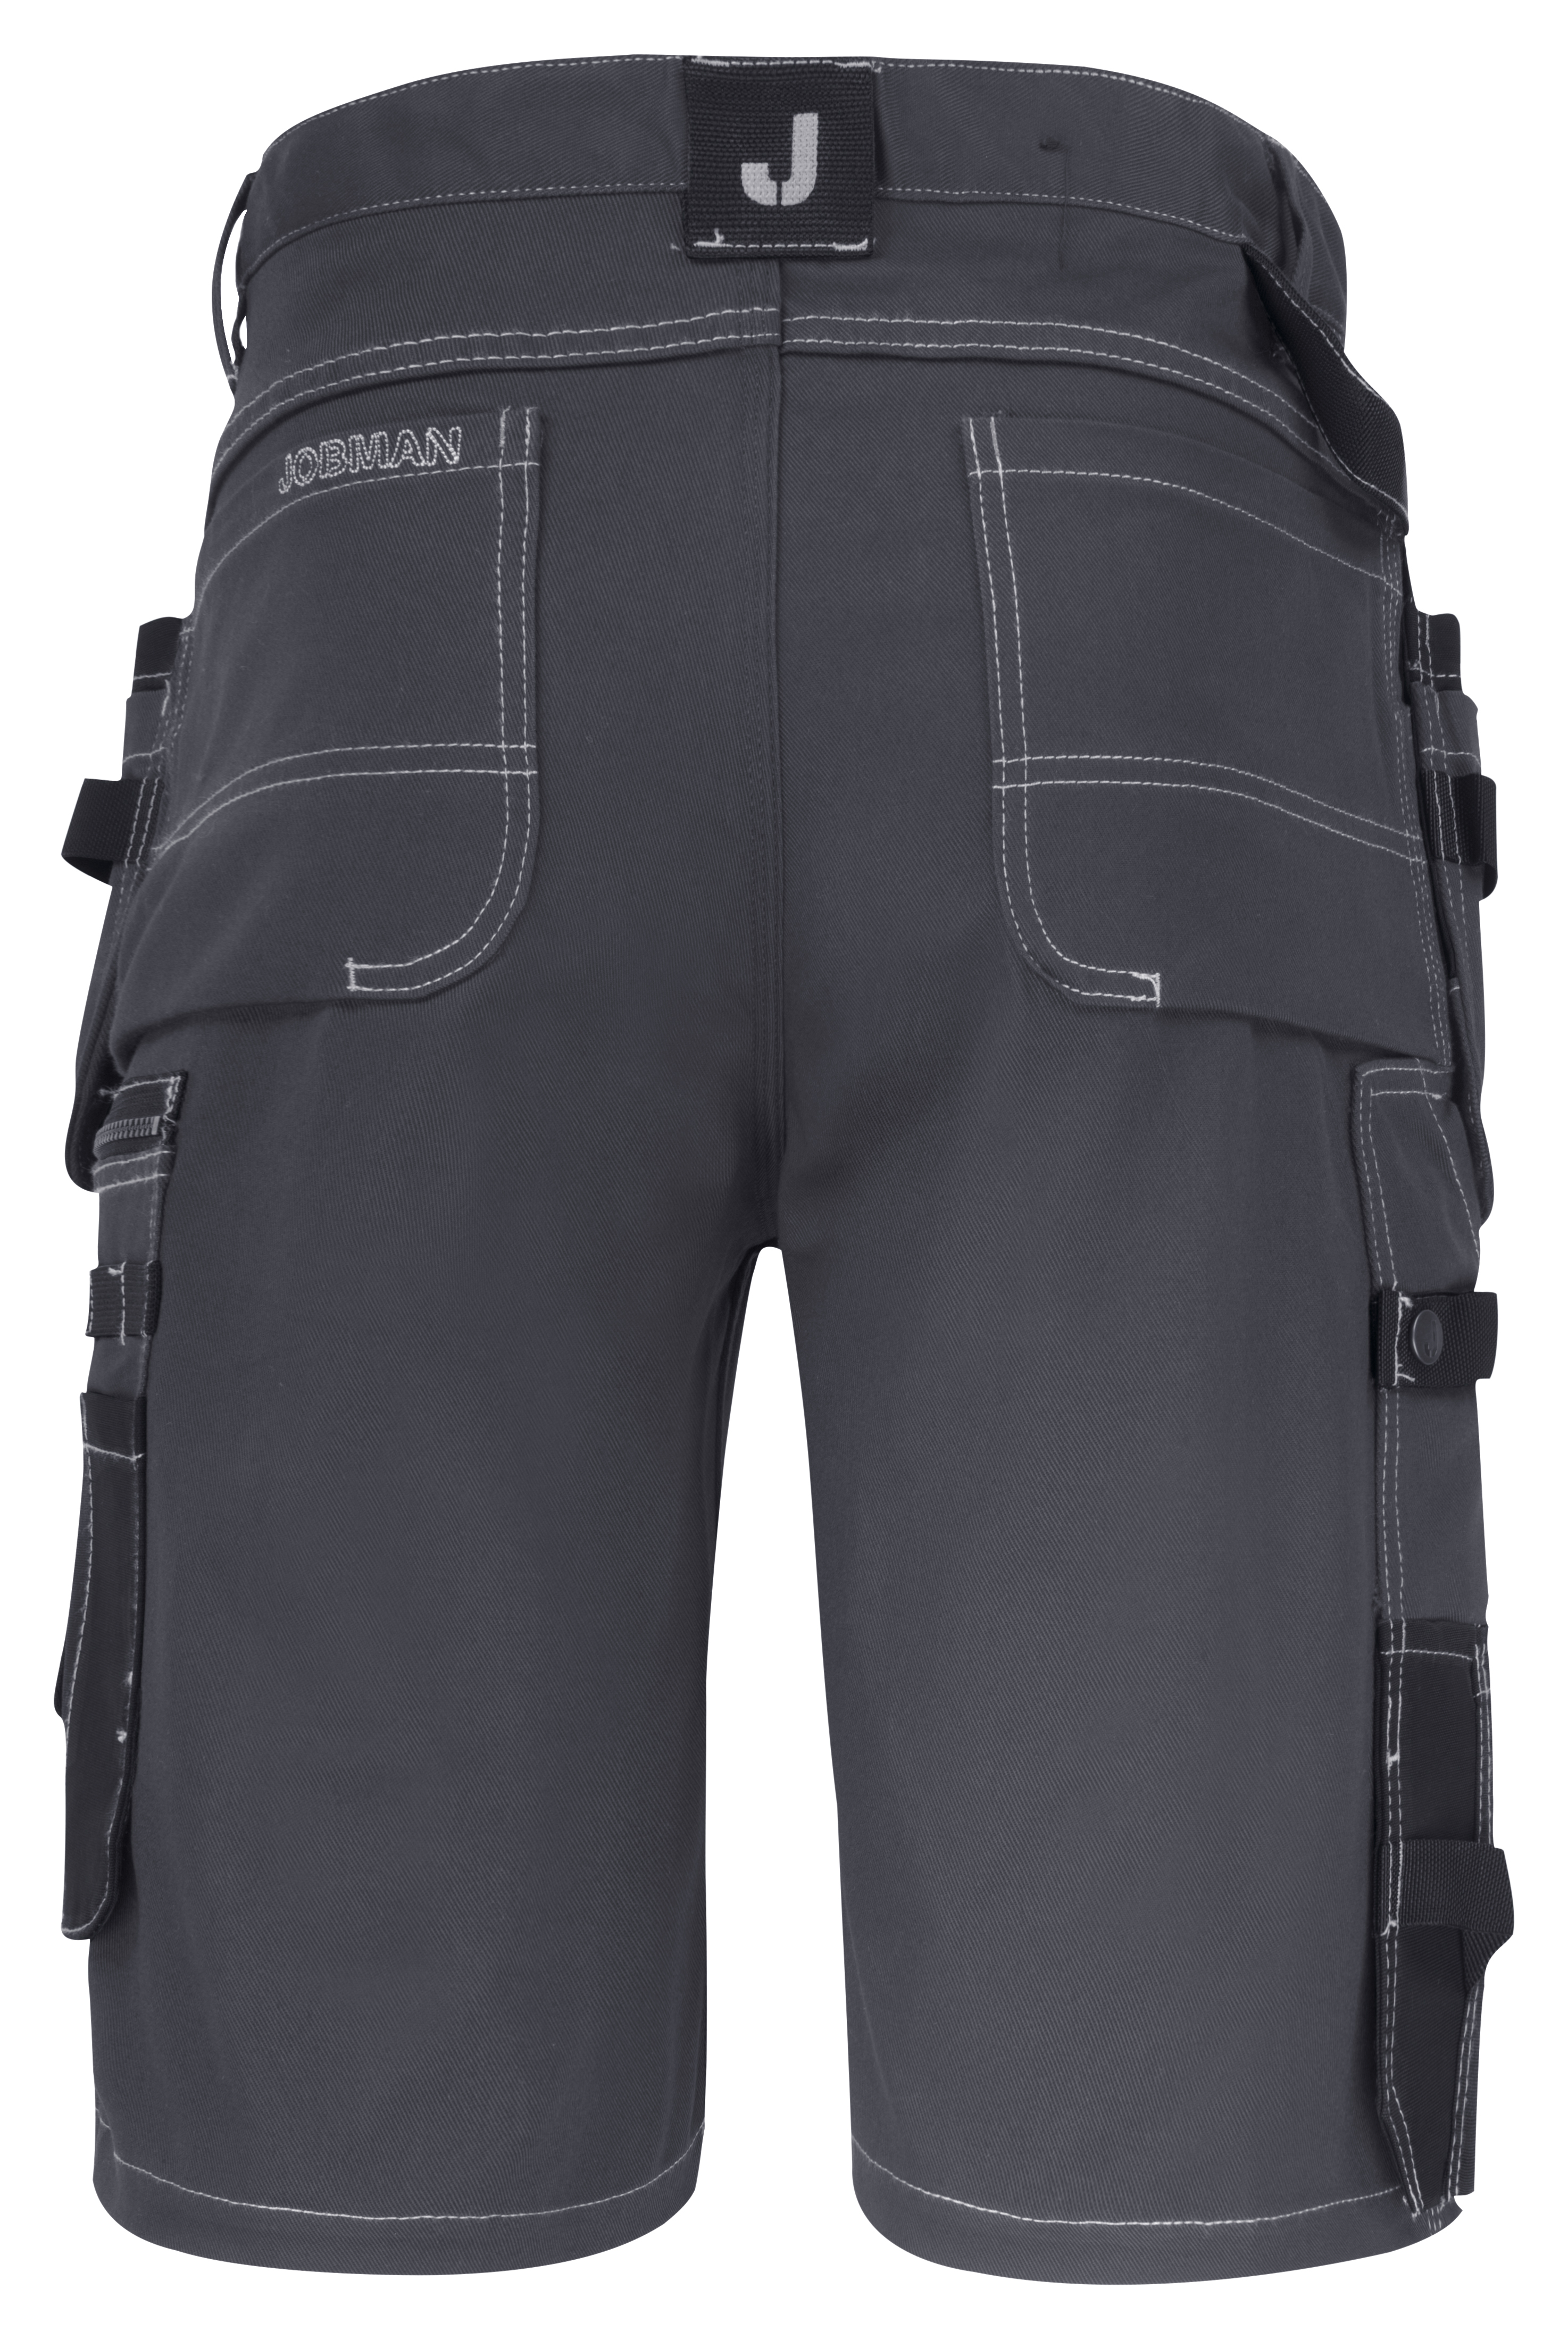 Jobman Craftsman Work Shorts